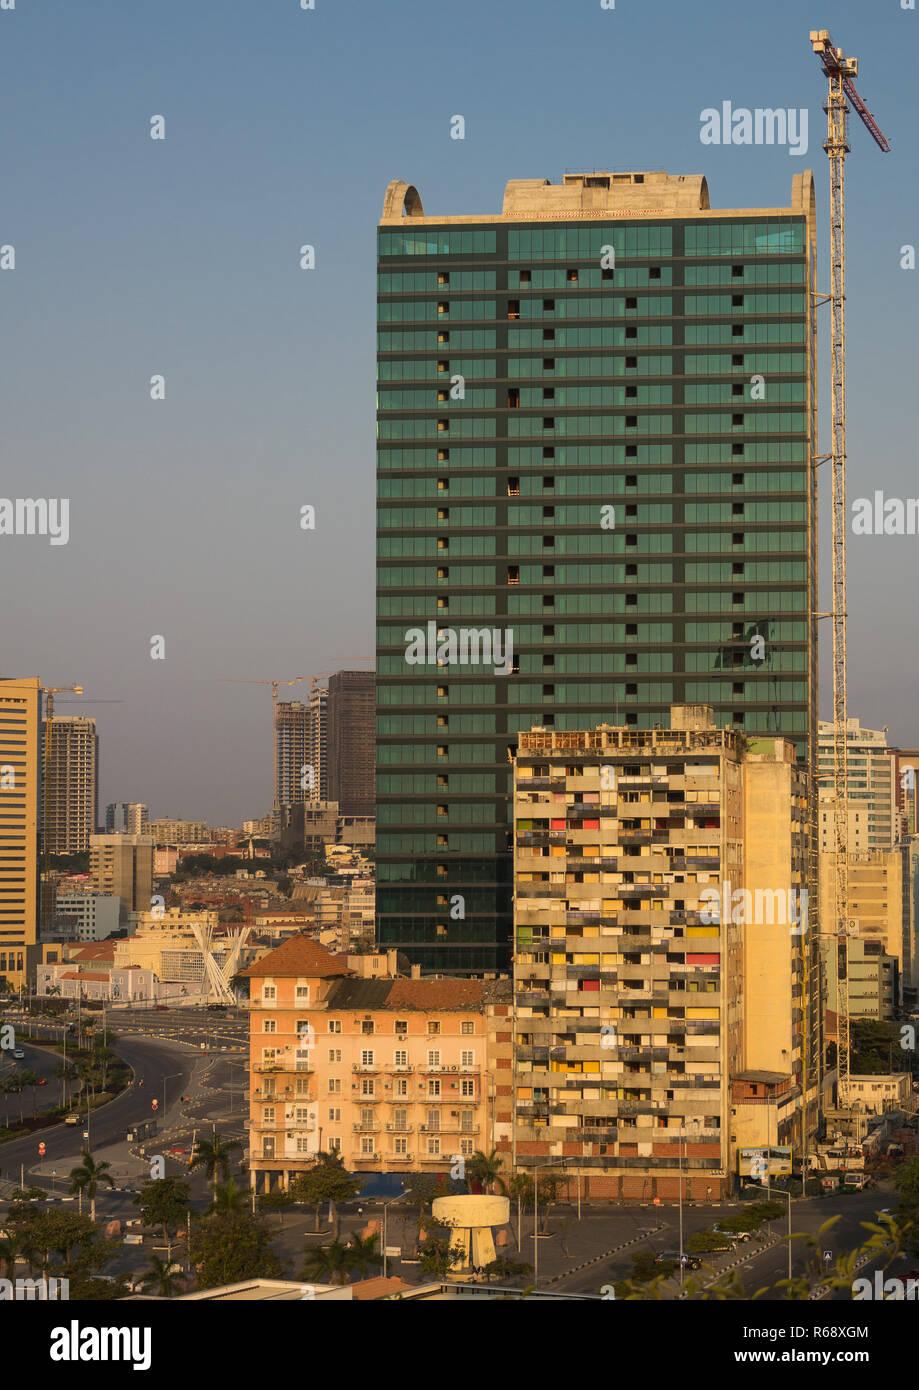 Buildings along the Marginal promenade in Luanda city center at sunset, Luanda Province, Luanda, Angola - Stock Image